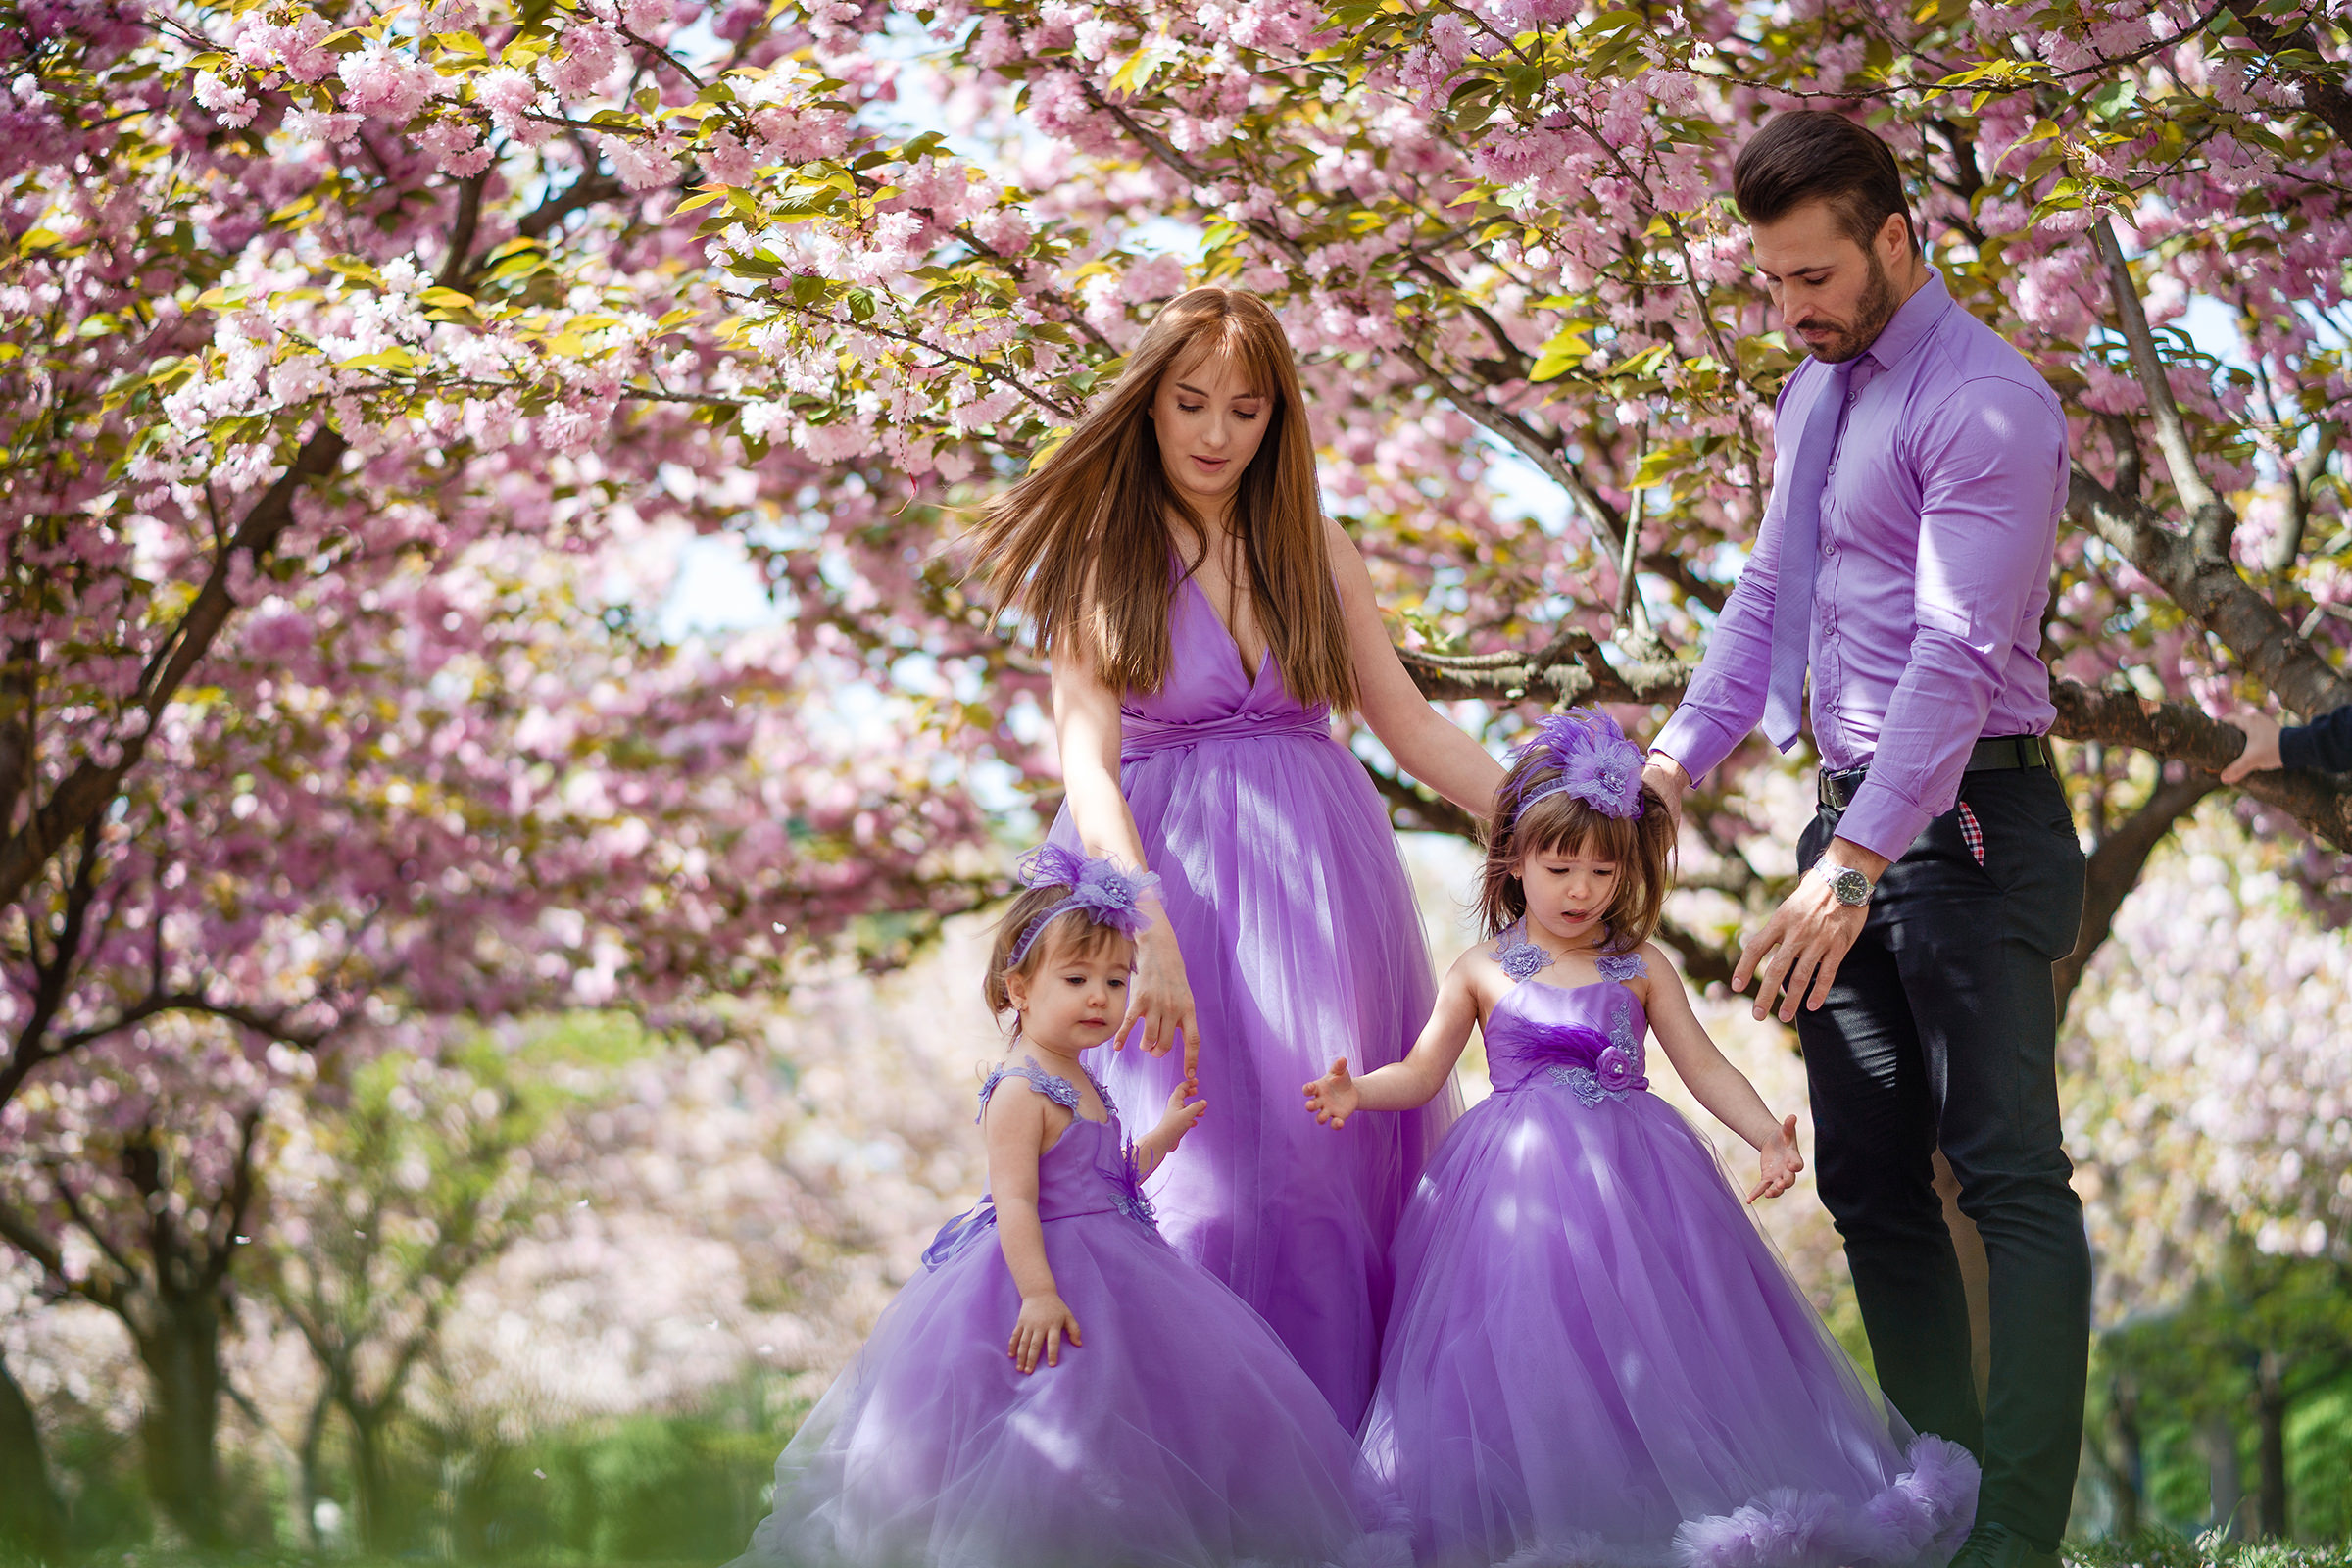 Amintiri de familie in culori de primavara